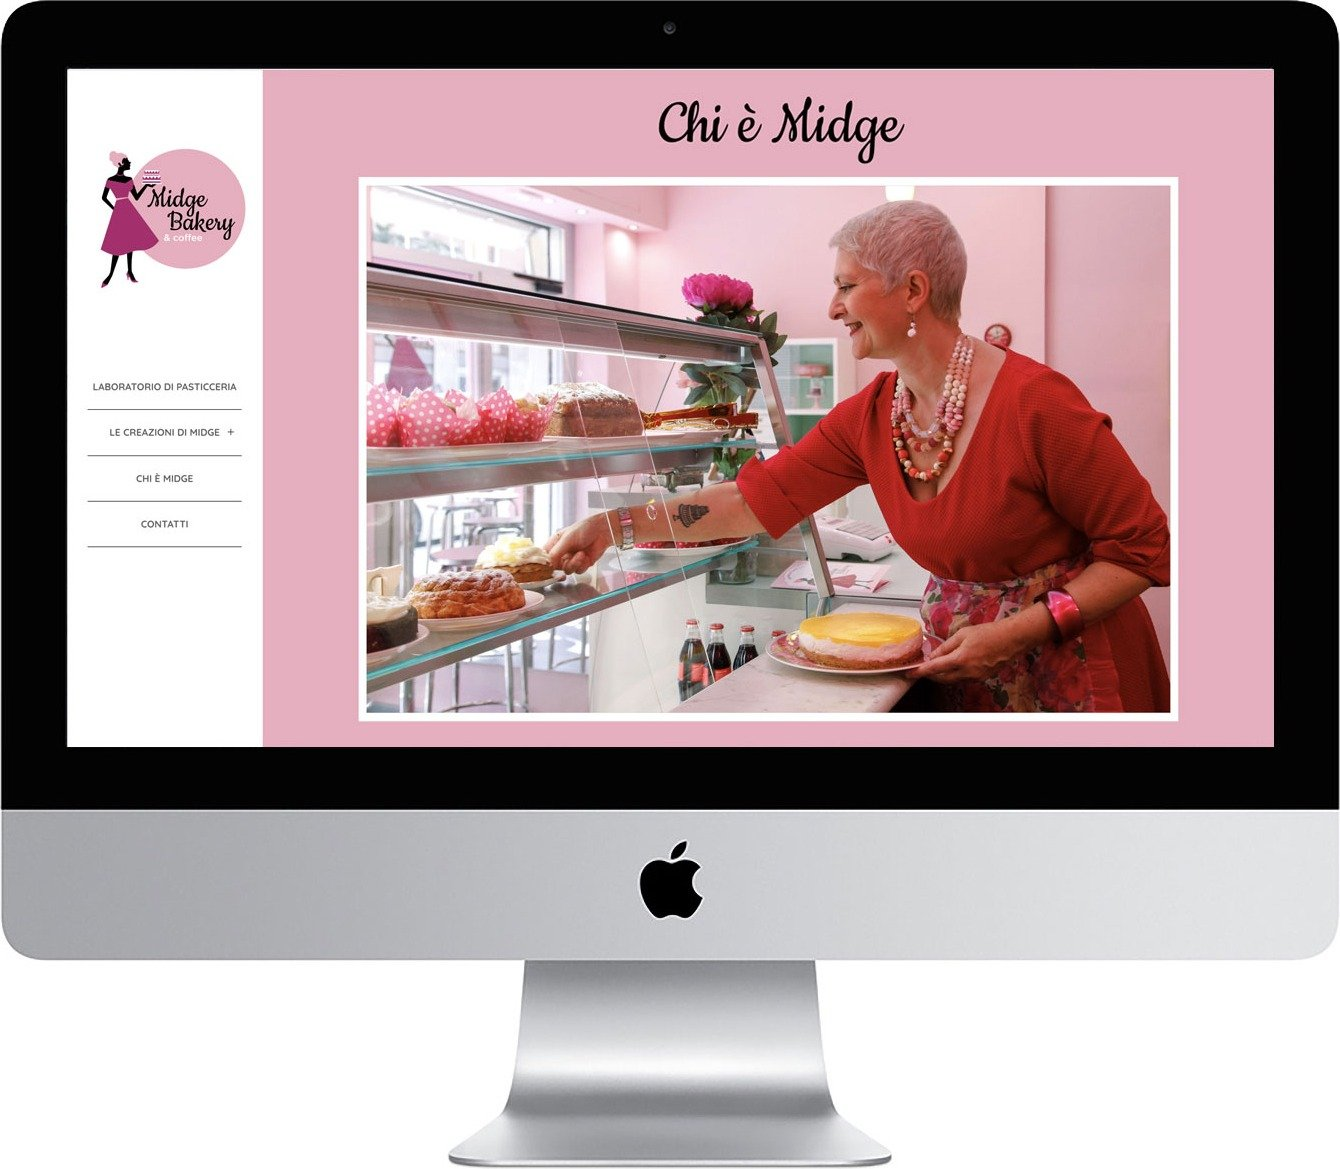 sublime food design midge bakery websiyte 1